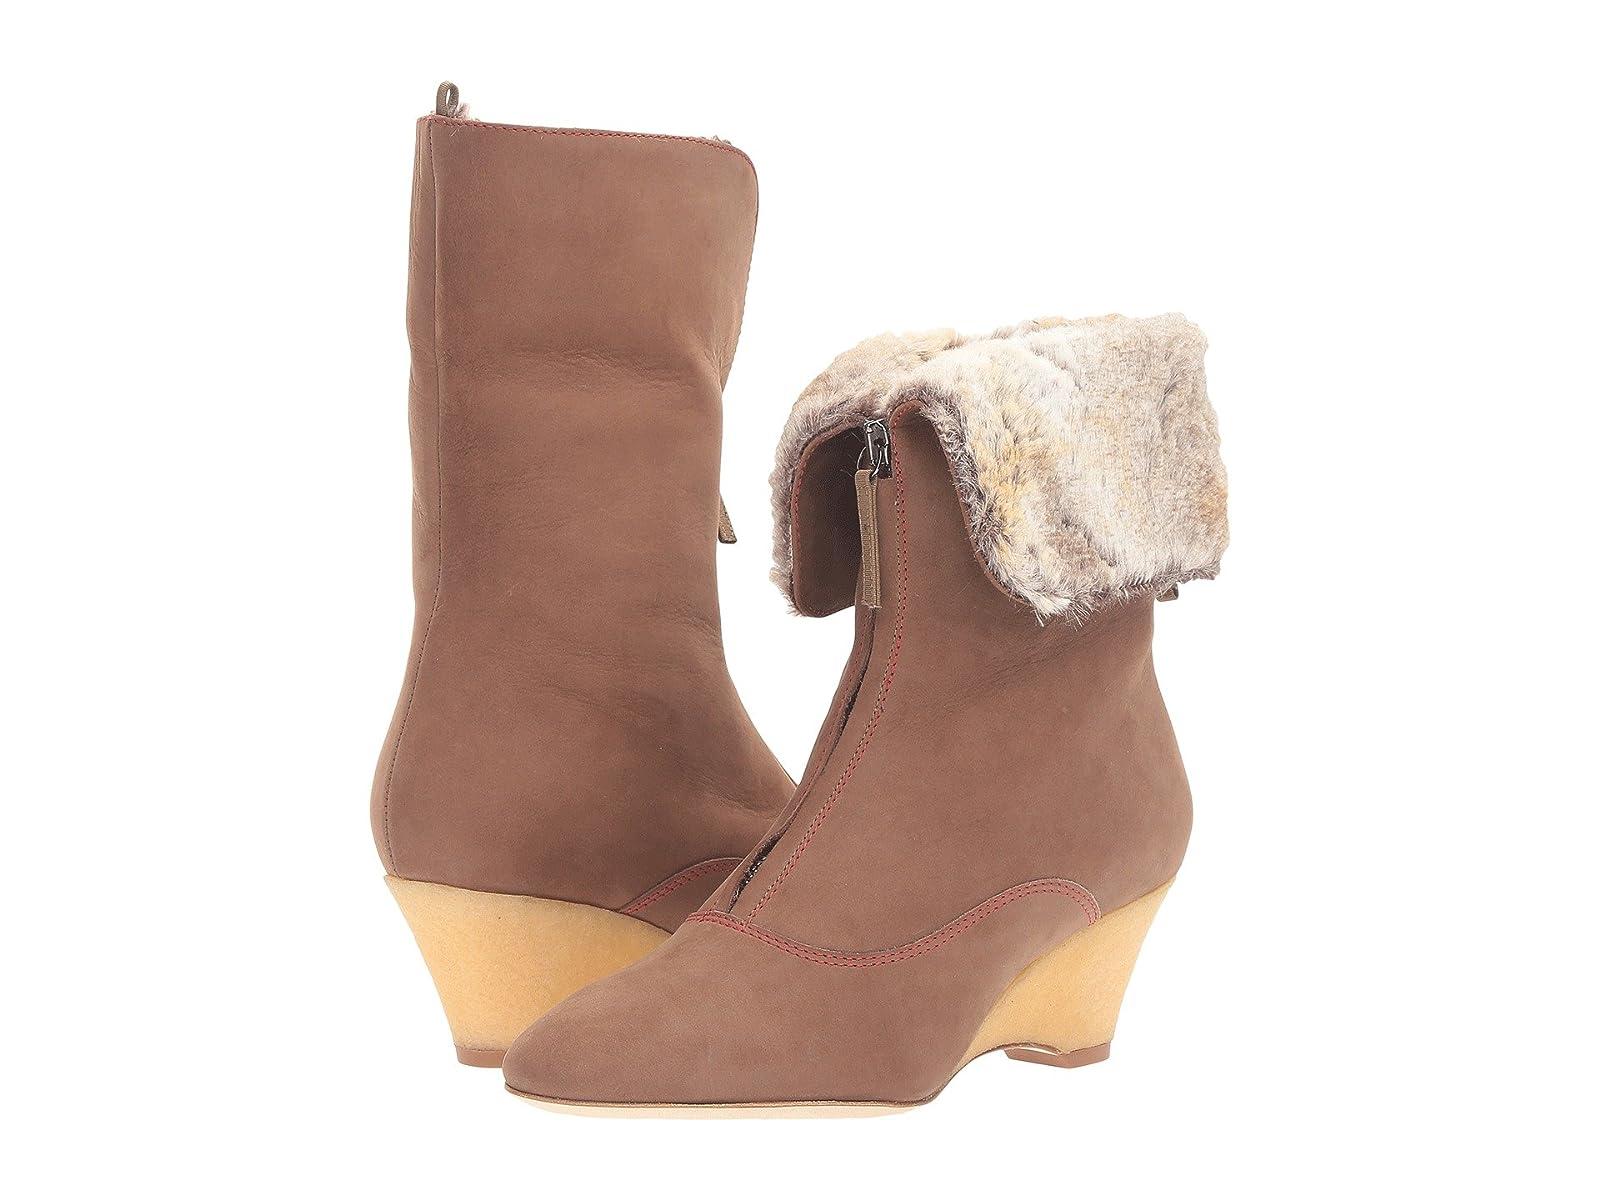 SJP by Sarah Jessica Parker ApresCheap and distinctive eye-catching shoes